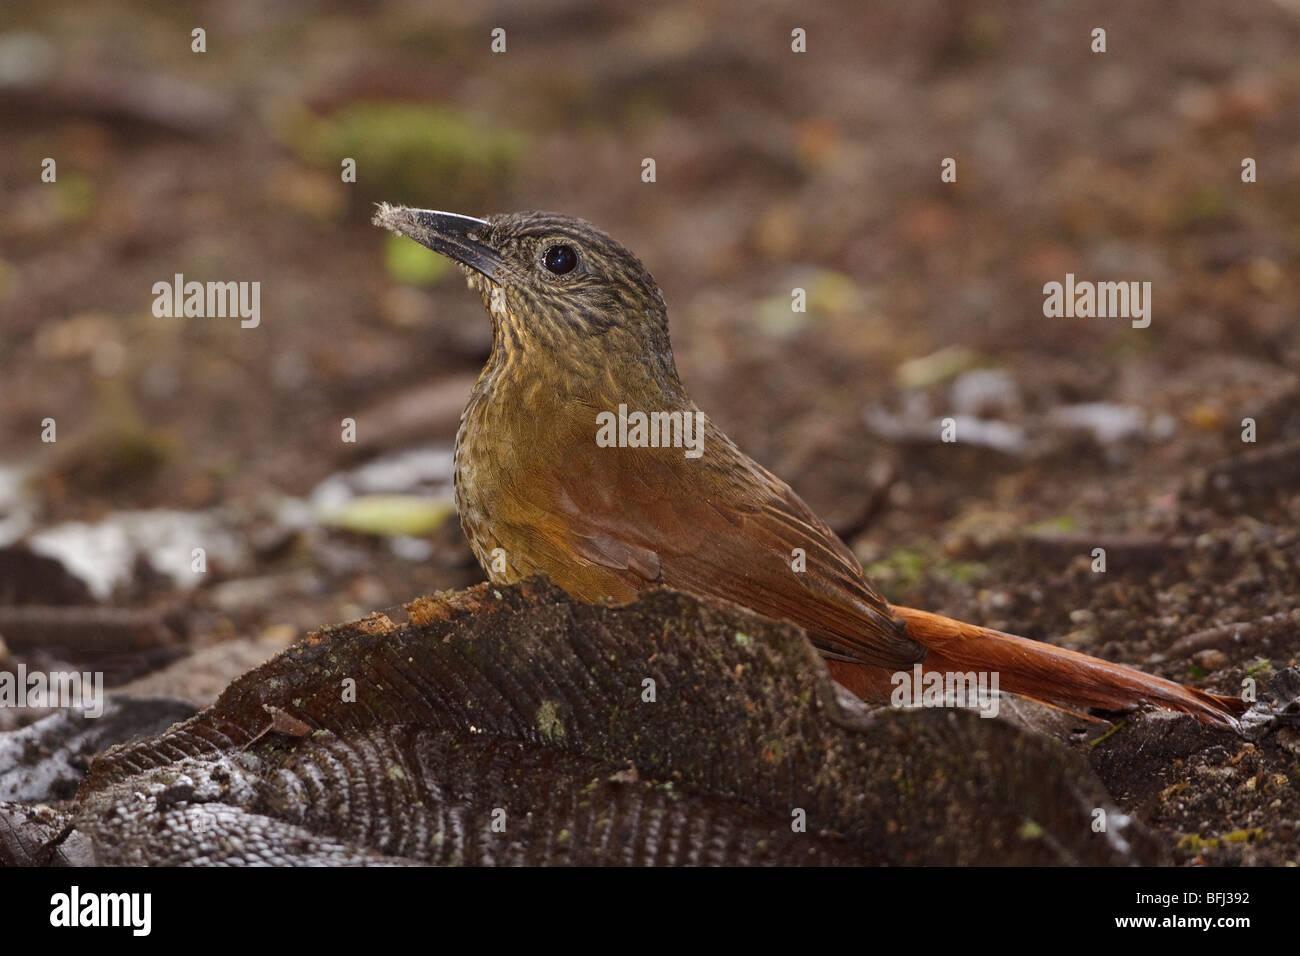 Streifen-capped Treehunter (Thripadectes Virgaticeps) in der Tandayapa Tal von Ecuador. Stockfoto